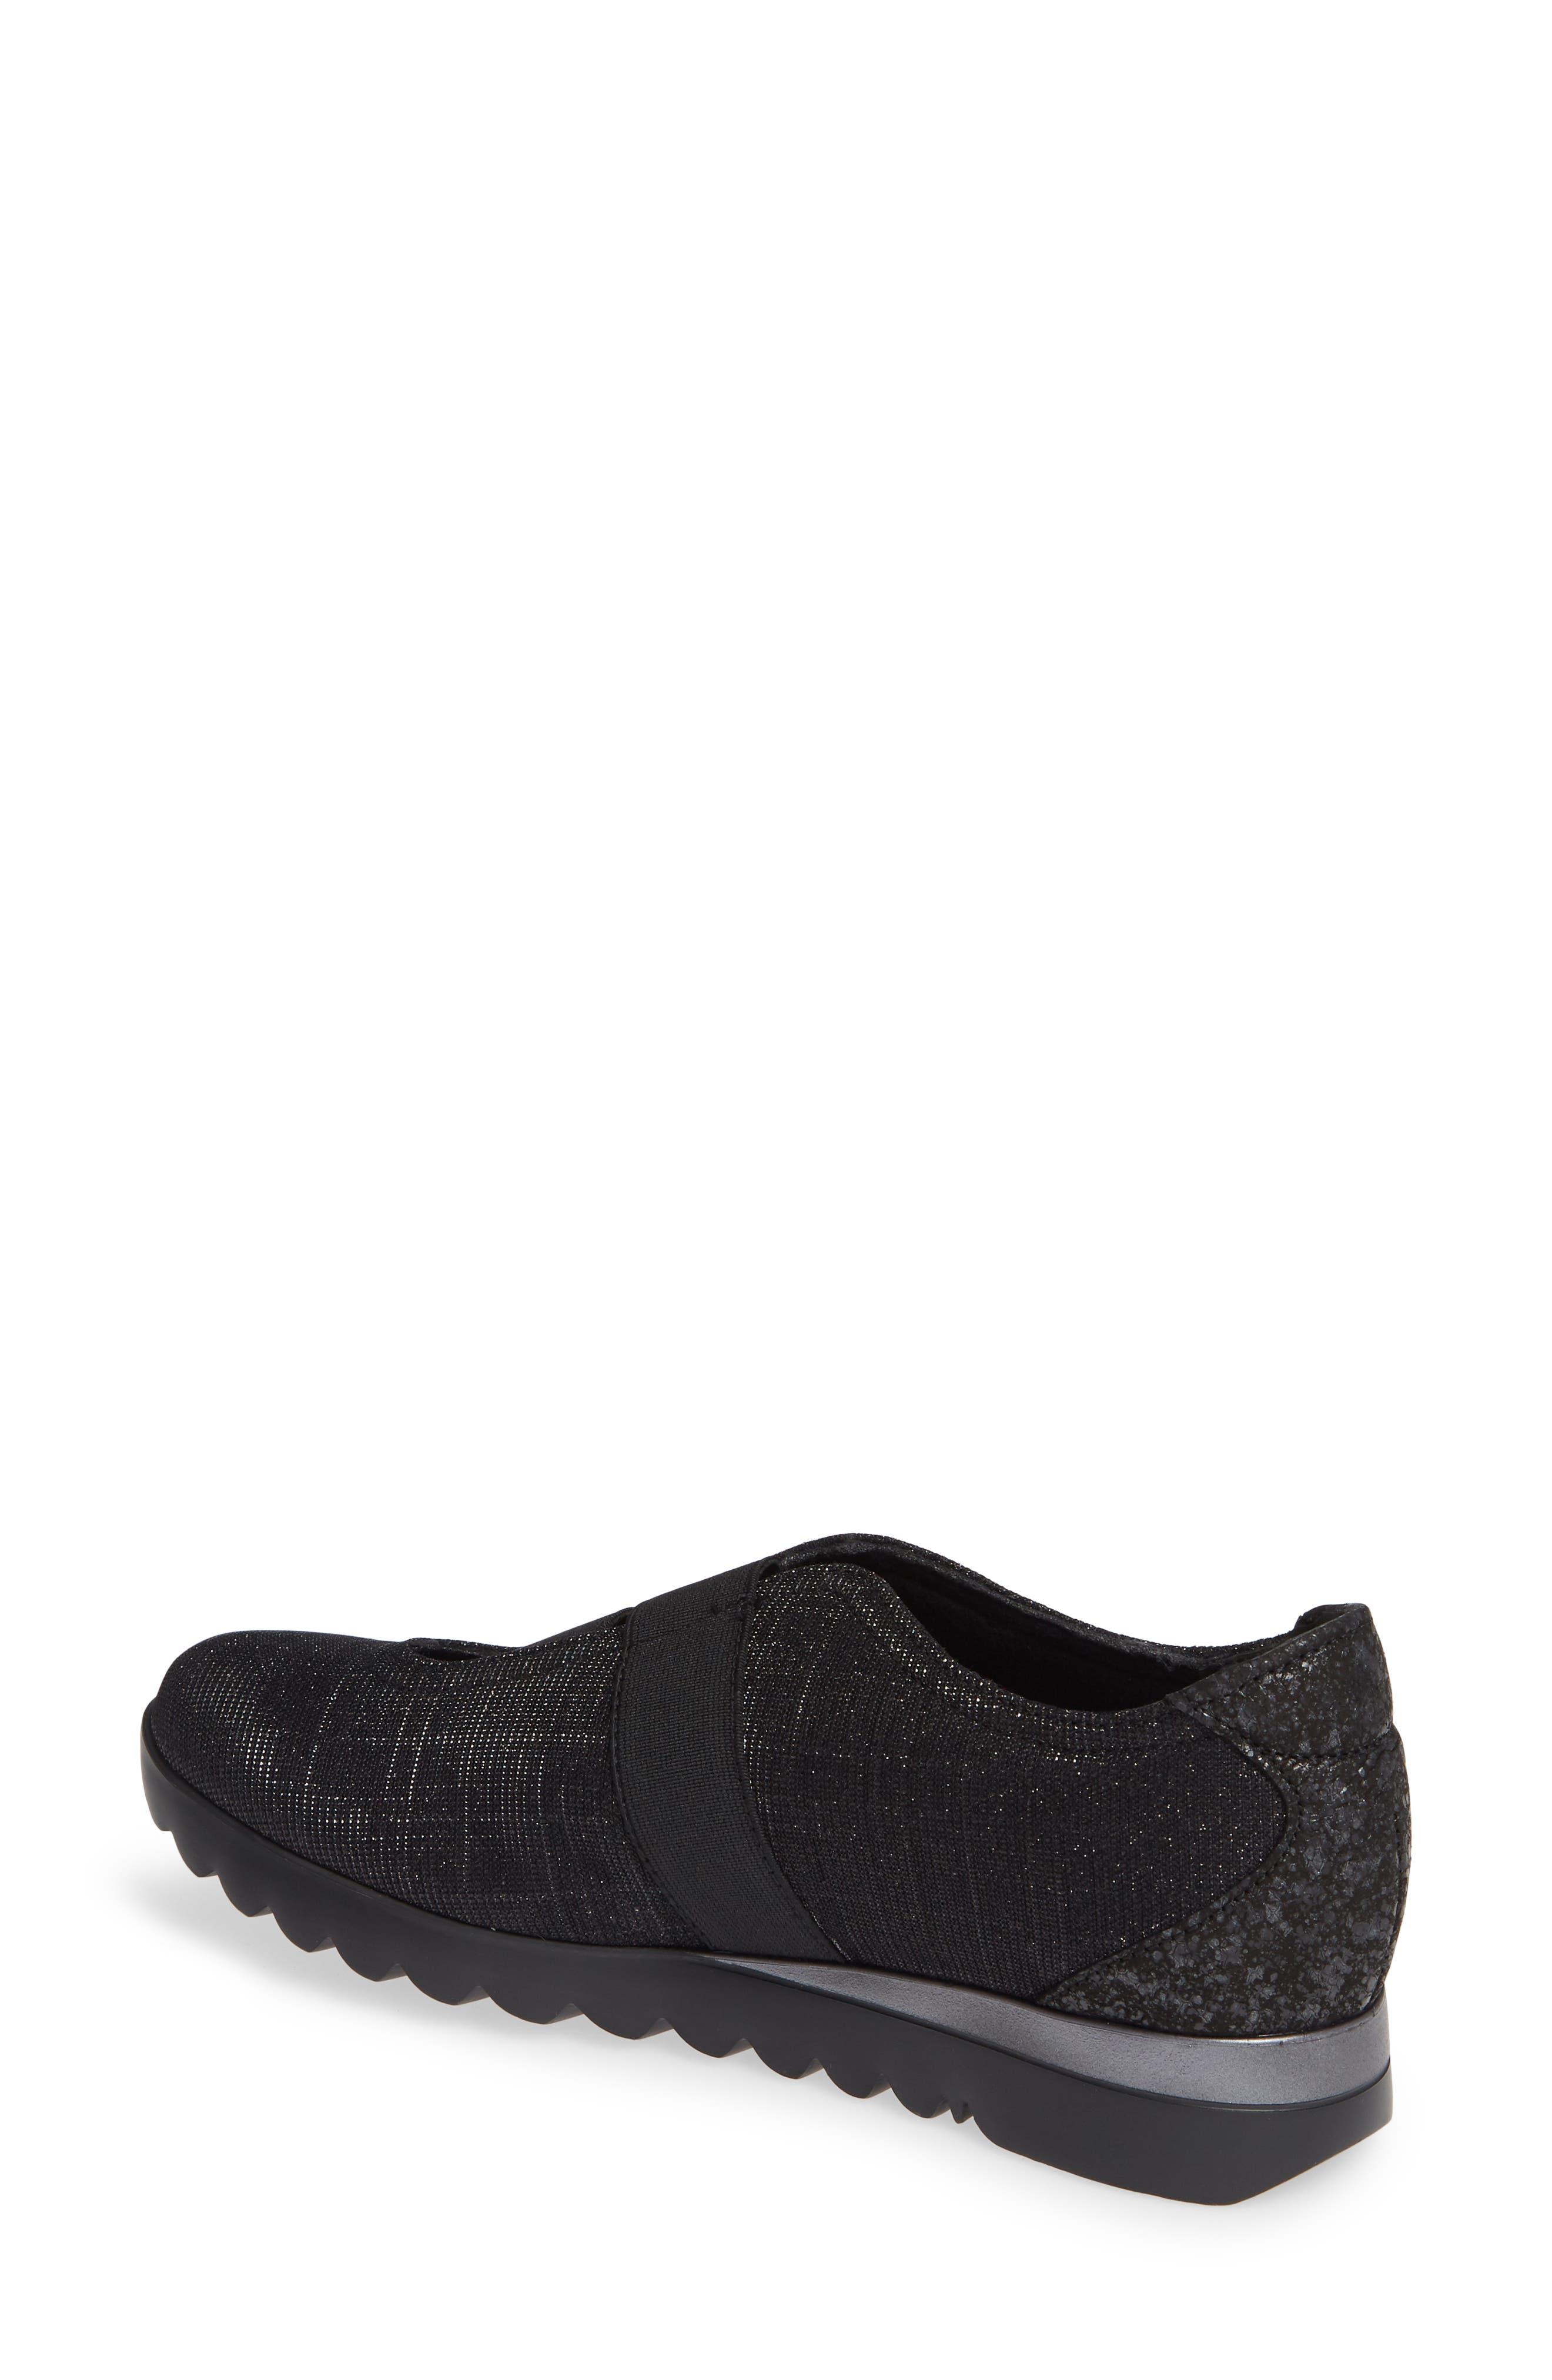 MUNRO, Alta Slip-On Sneaker, Alternate thumbnail 2, color, BLACK SPARKLE FABRIC